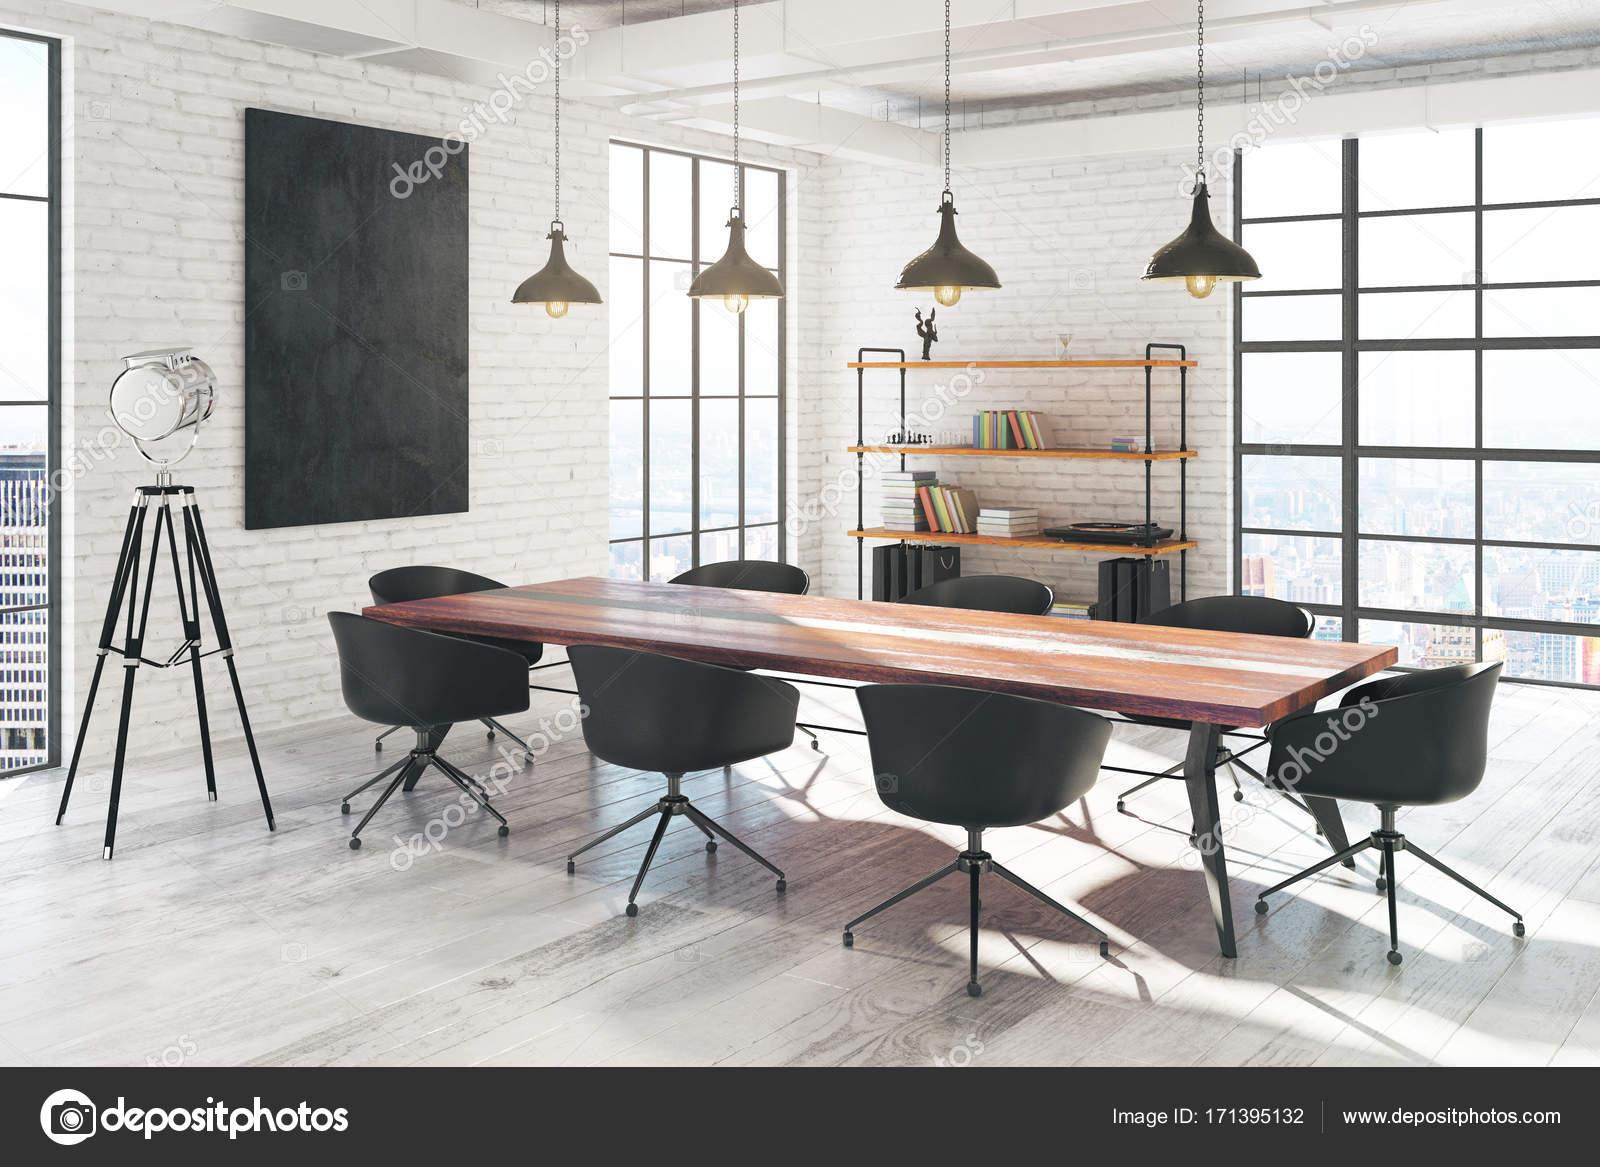 Meeting Raum Innenraum mit banner — Stockfoto © peshkov #171395132